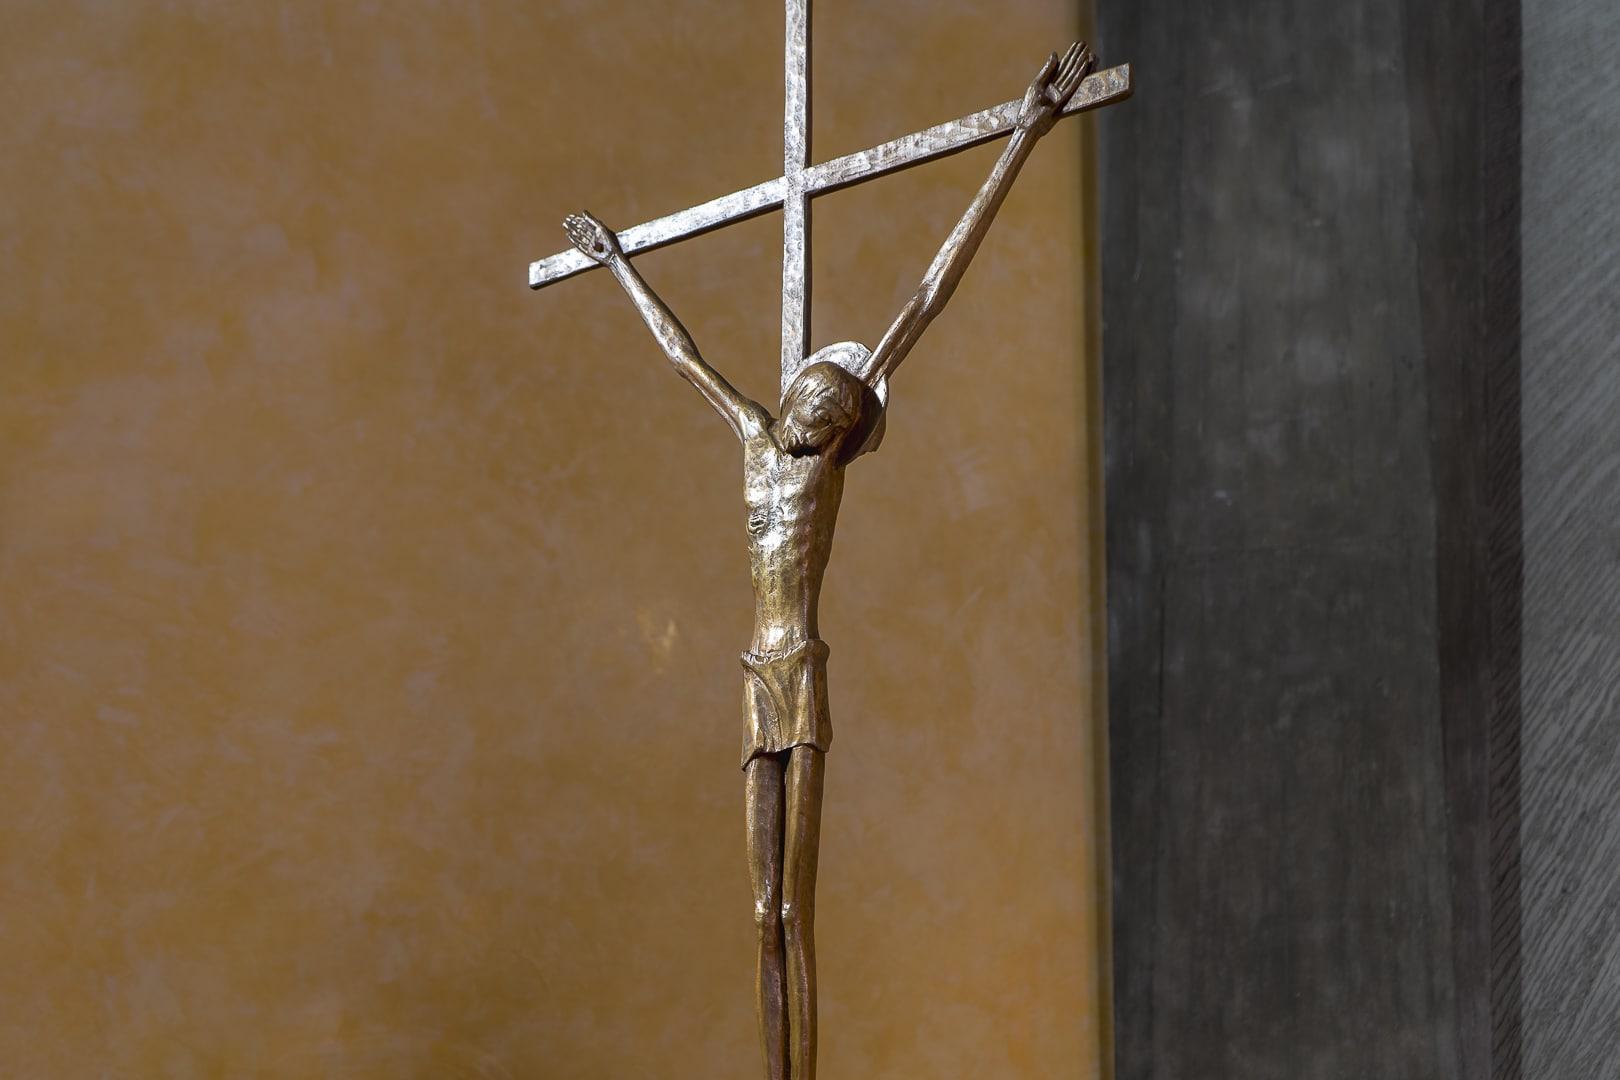 Crocifisso Chiesa Mater Divinae Gratiae Brescia